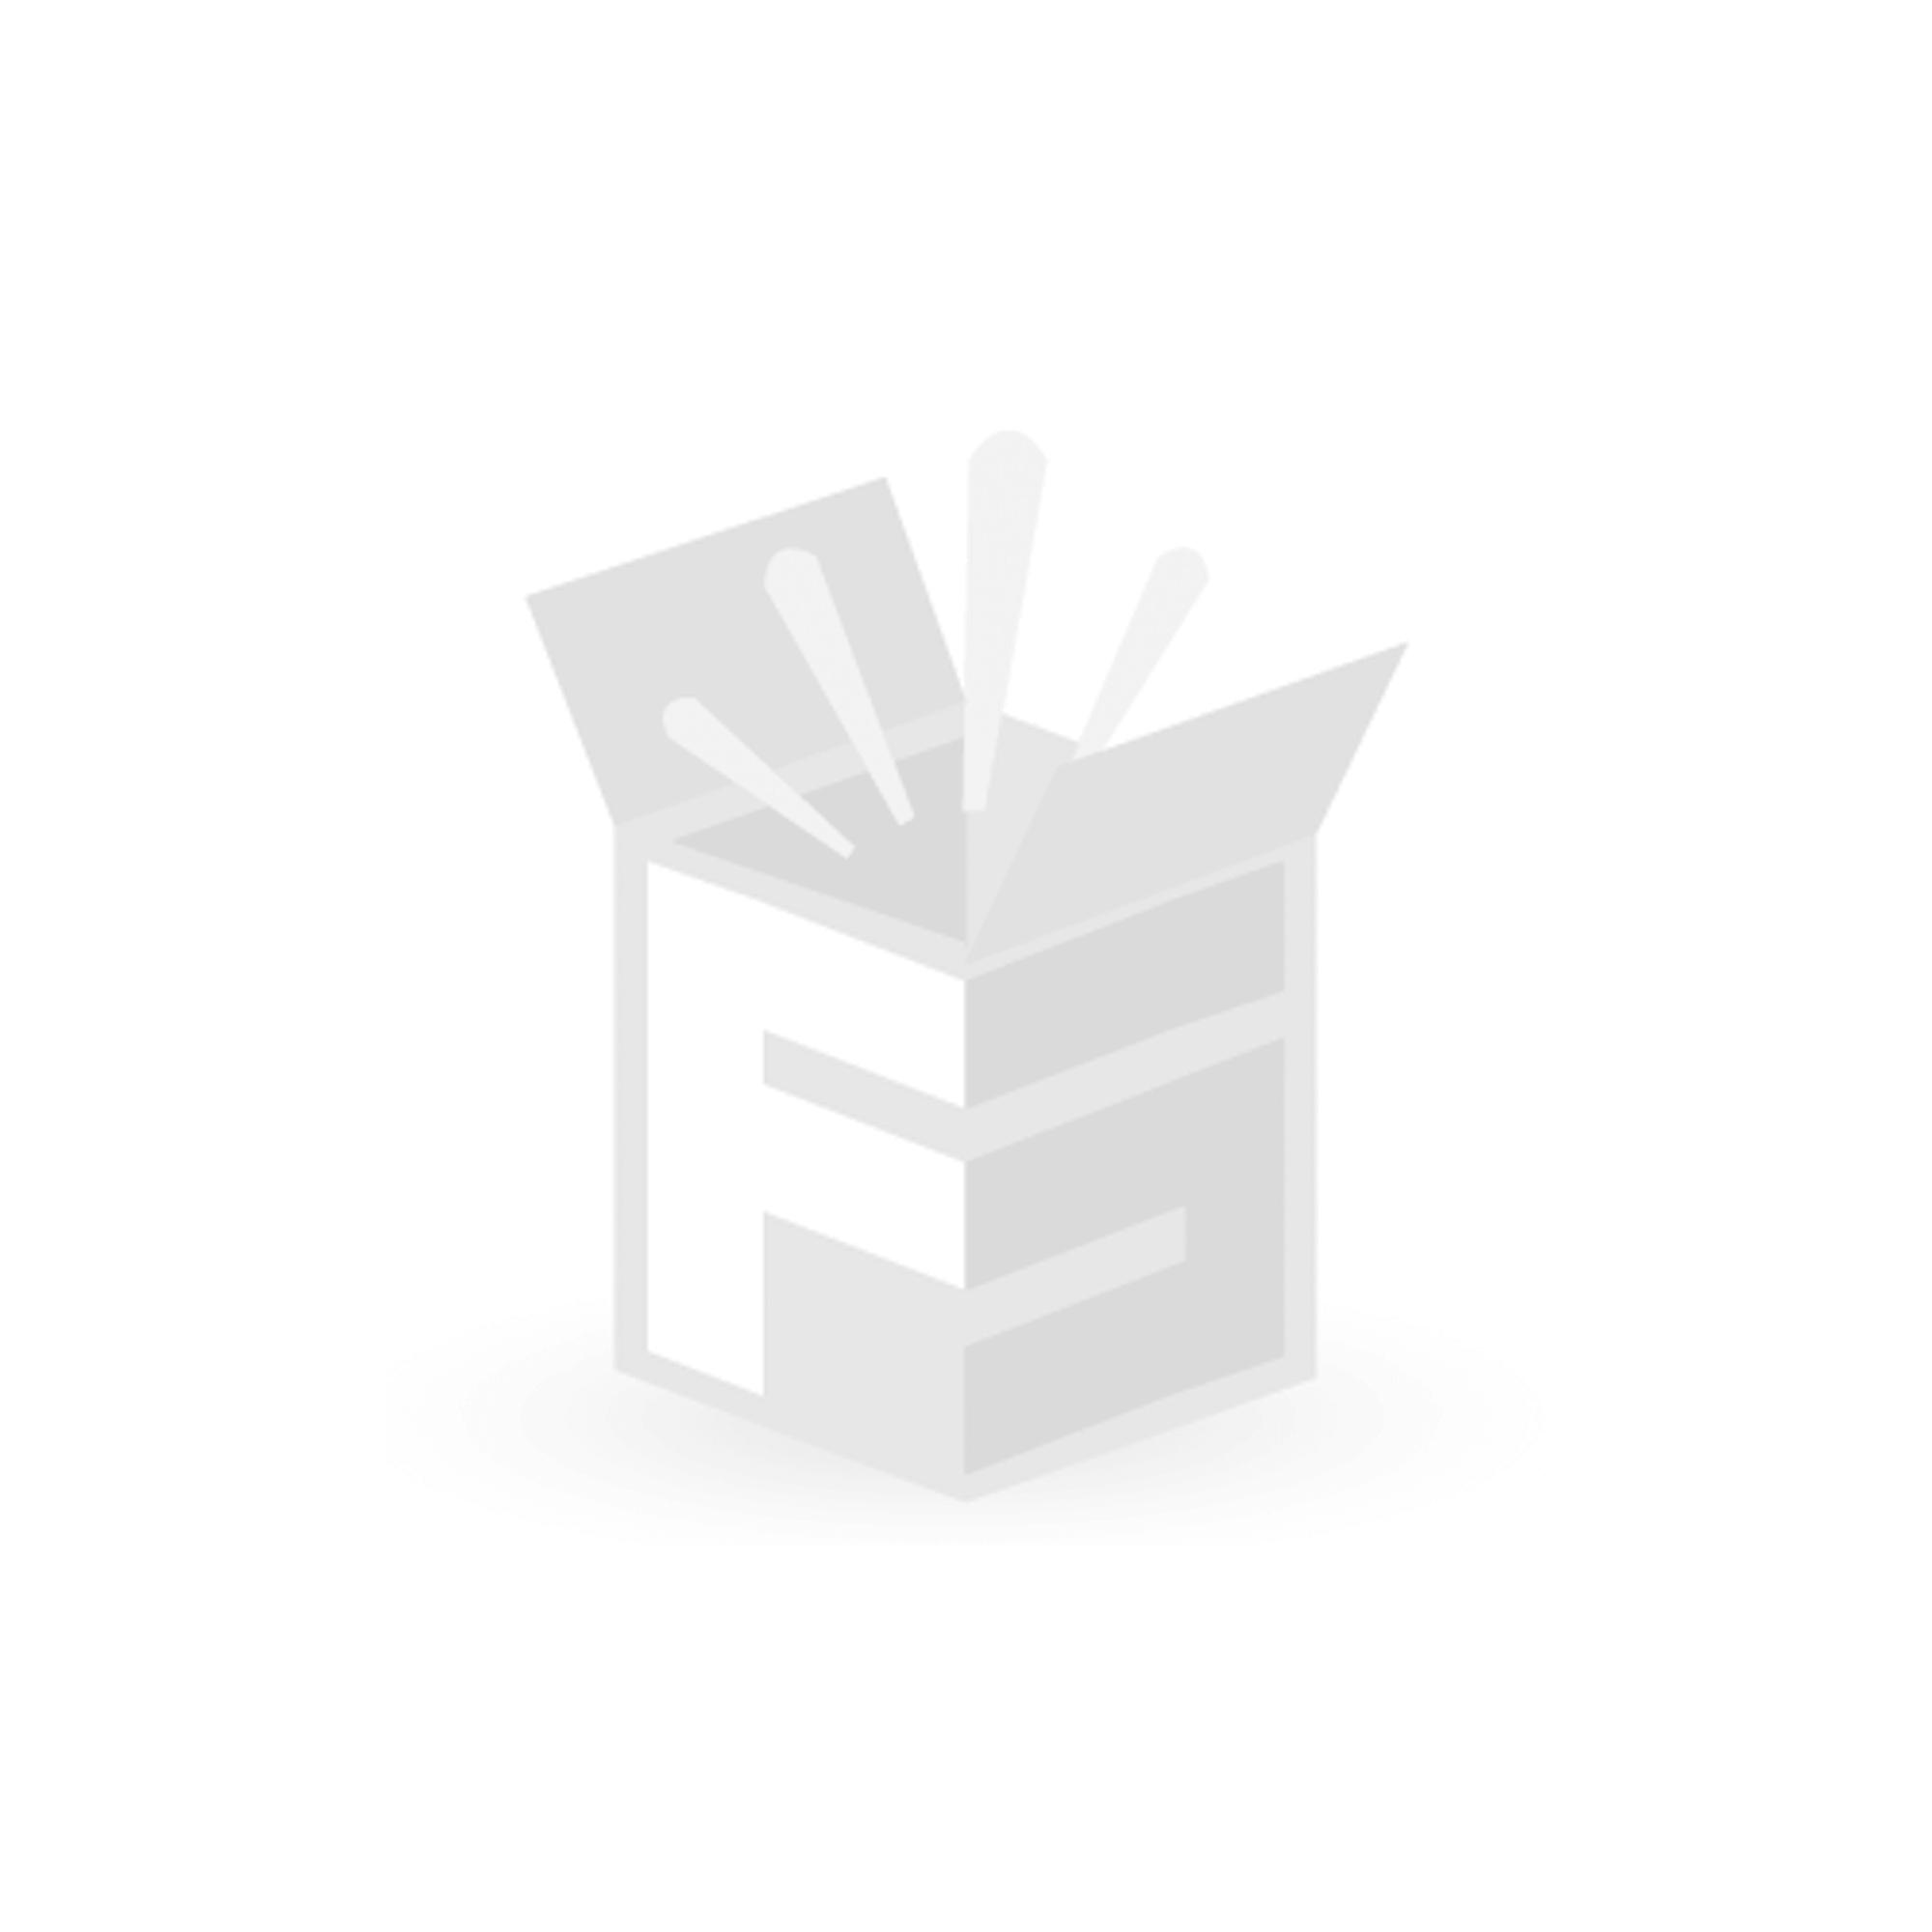 Tunturi Fitness-Trampolin Hexagon mit Handgriff, Ø 84 cm